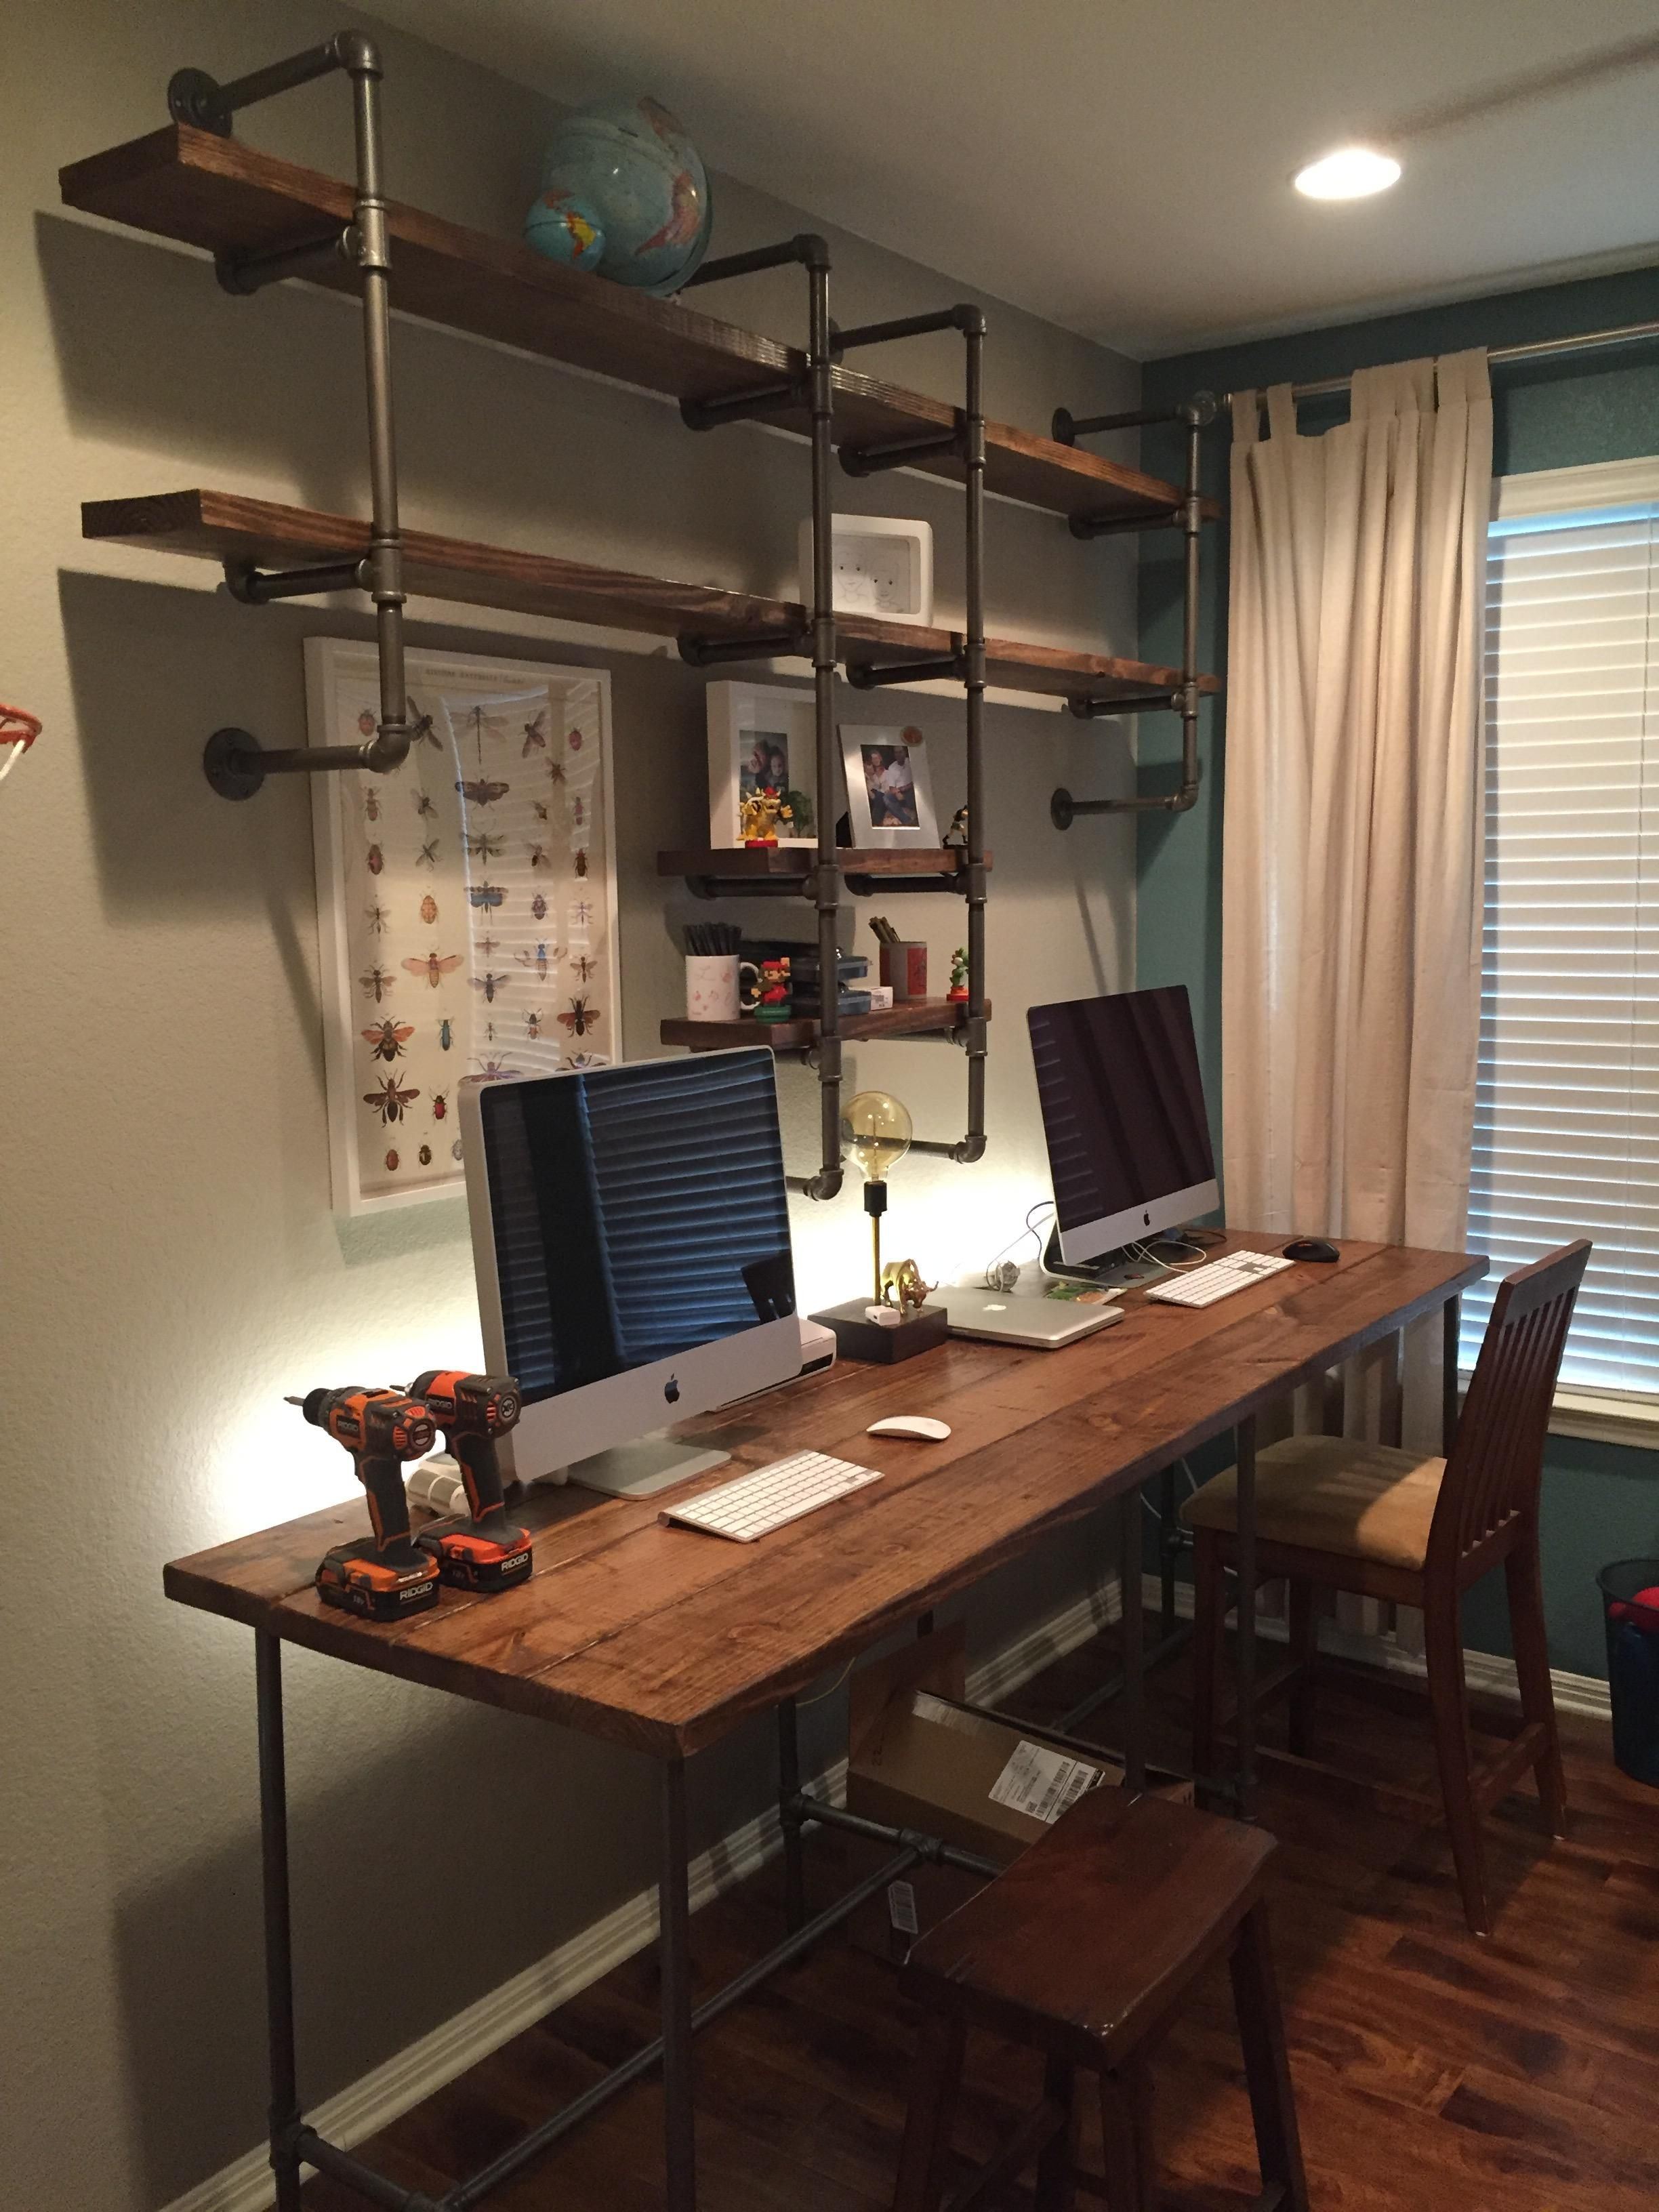 Pin By Amanda Dodd On Rustic Industrial Decor Desk Furniture